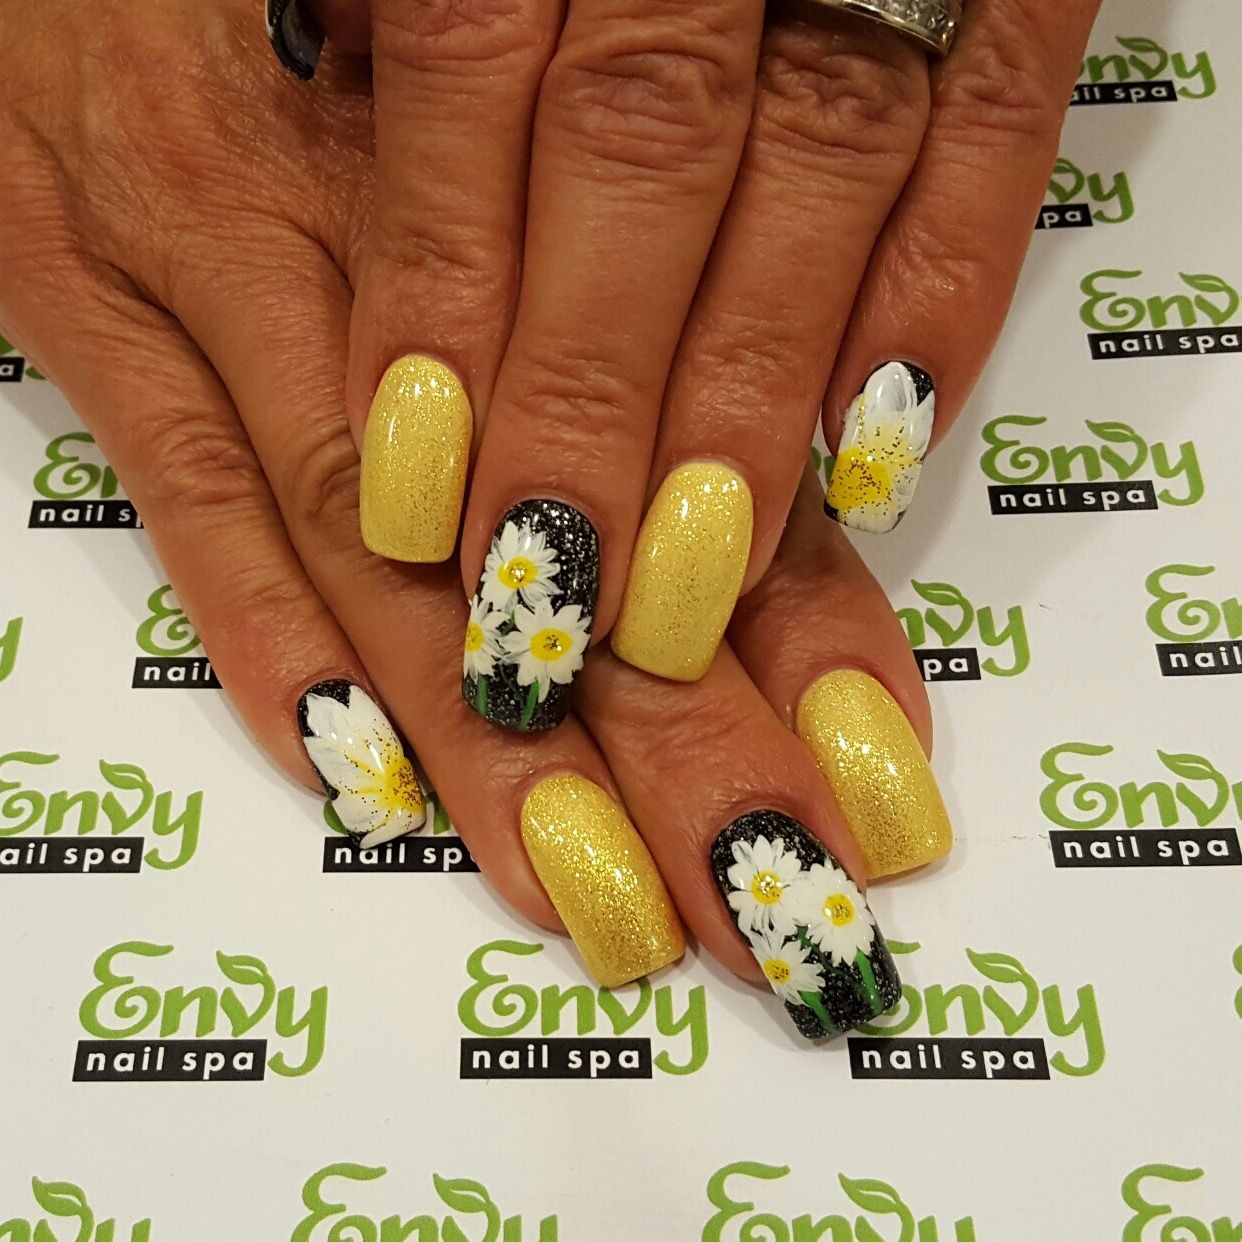 Daisy flowers yellow glitter nails envy nail spa